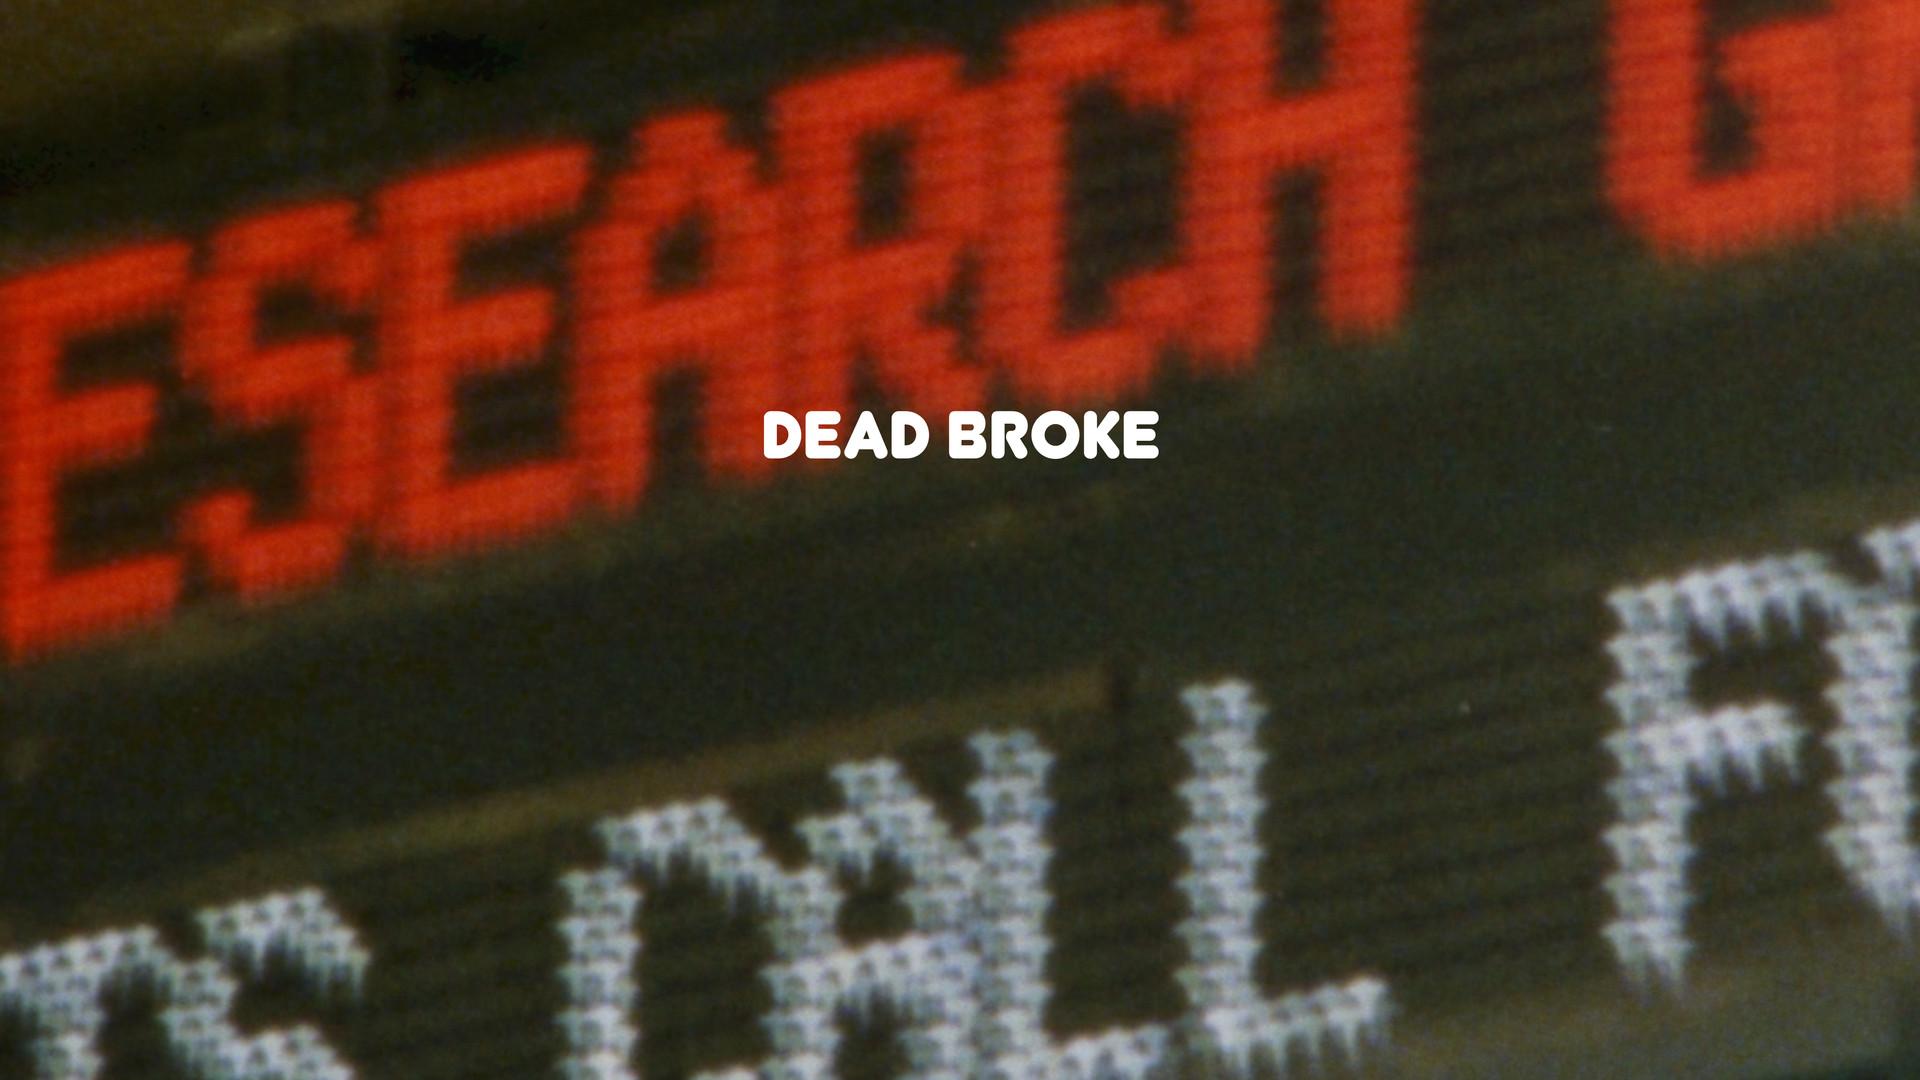 LOCAL N3WS PRESENTS: DEAD BROKE, A SHORT SKATE FILM